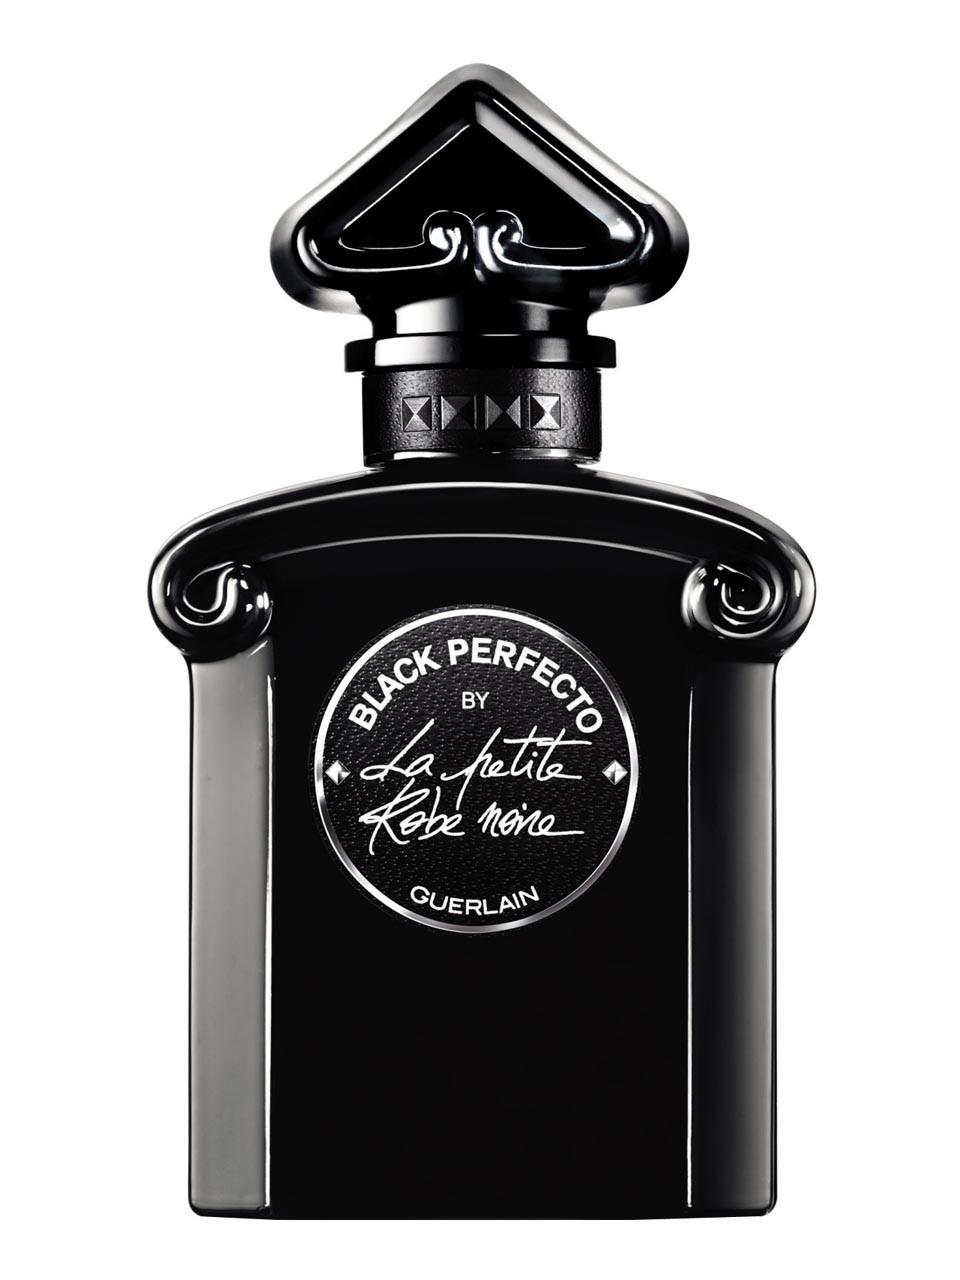 Guerlain Black Perfecto аромат для женщин